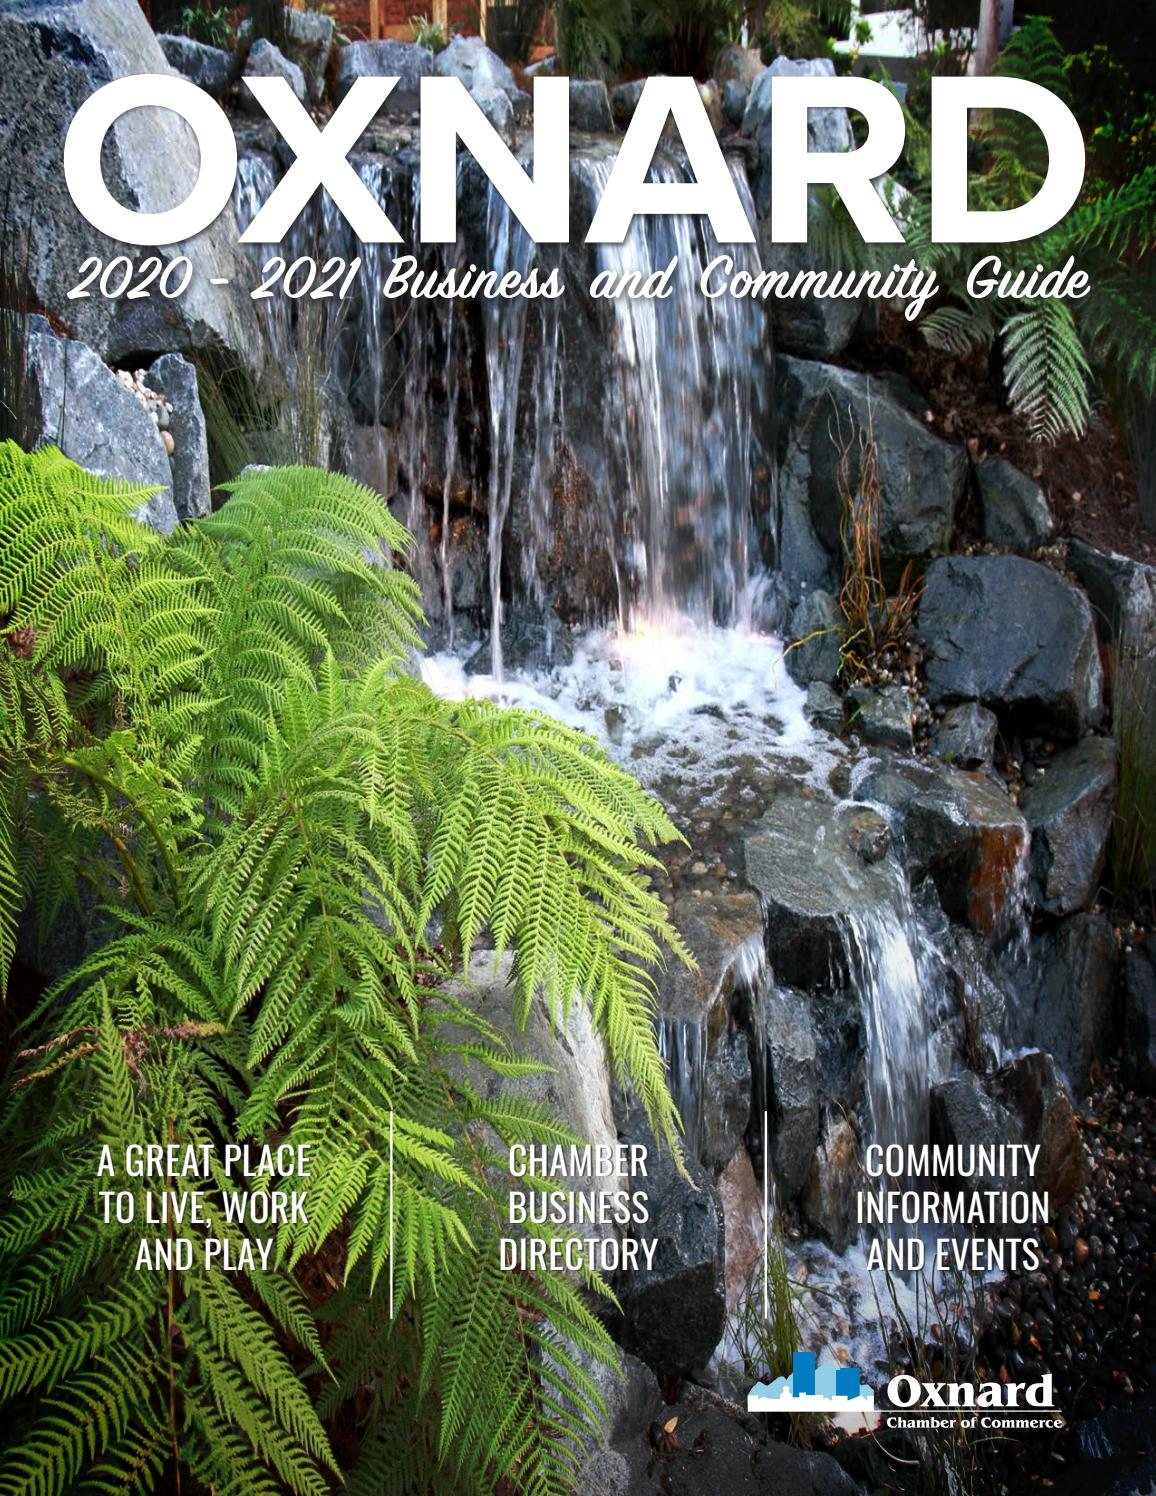 Camarillo Christmas Tree Lighting 2021 2020 2021 Oxnard Business Community Guide By Oxnard Chamber Of Commerce Issuu